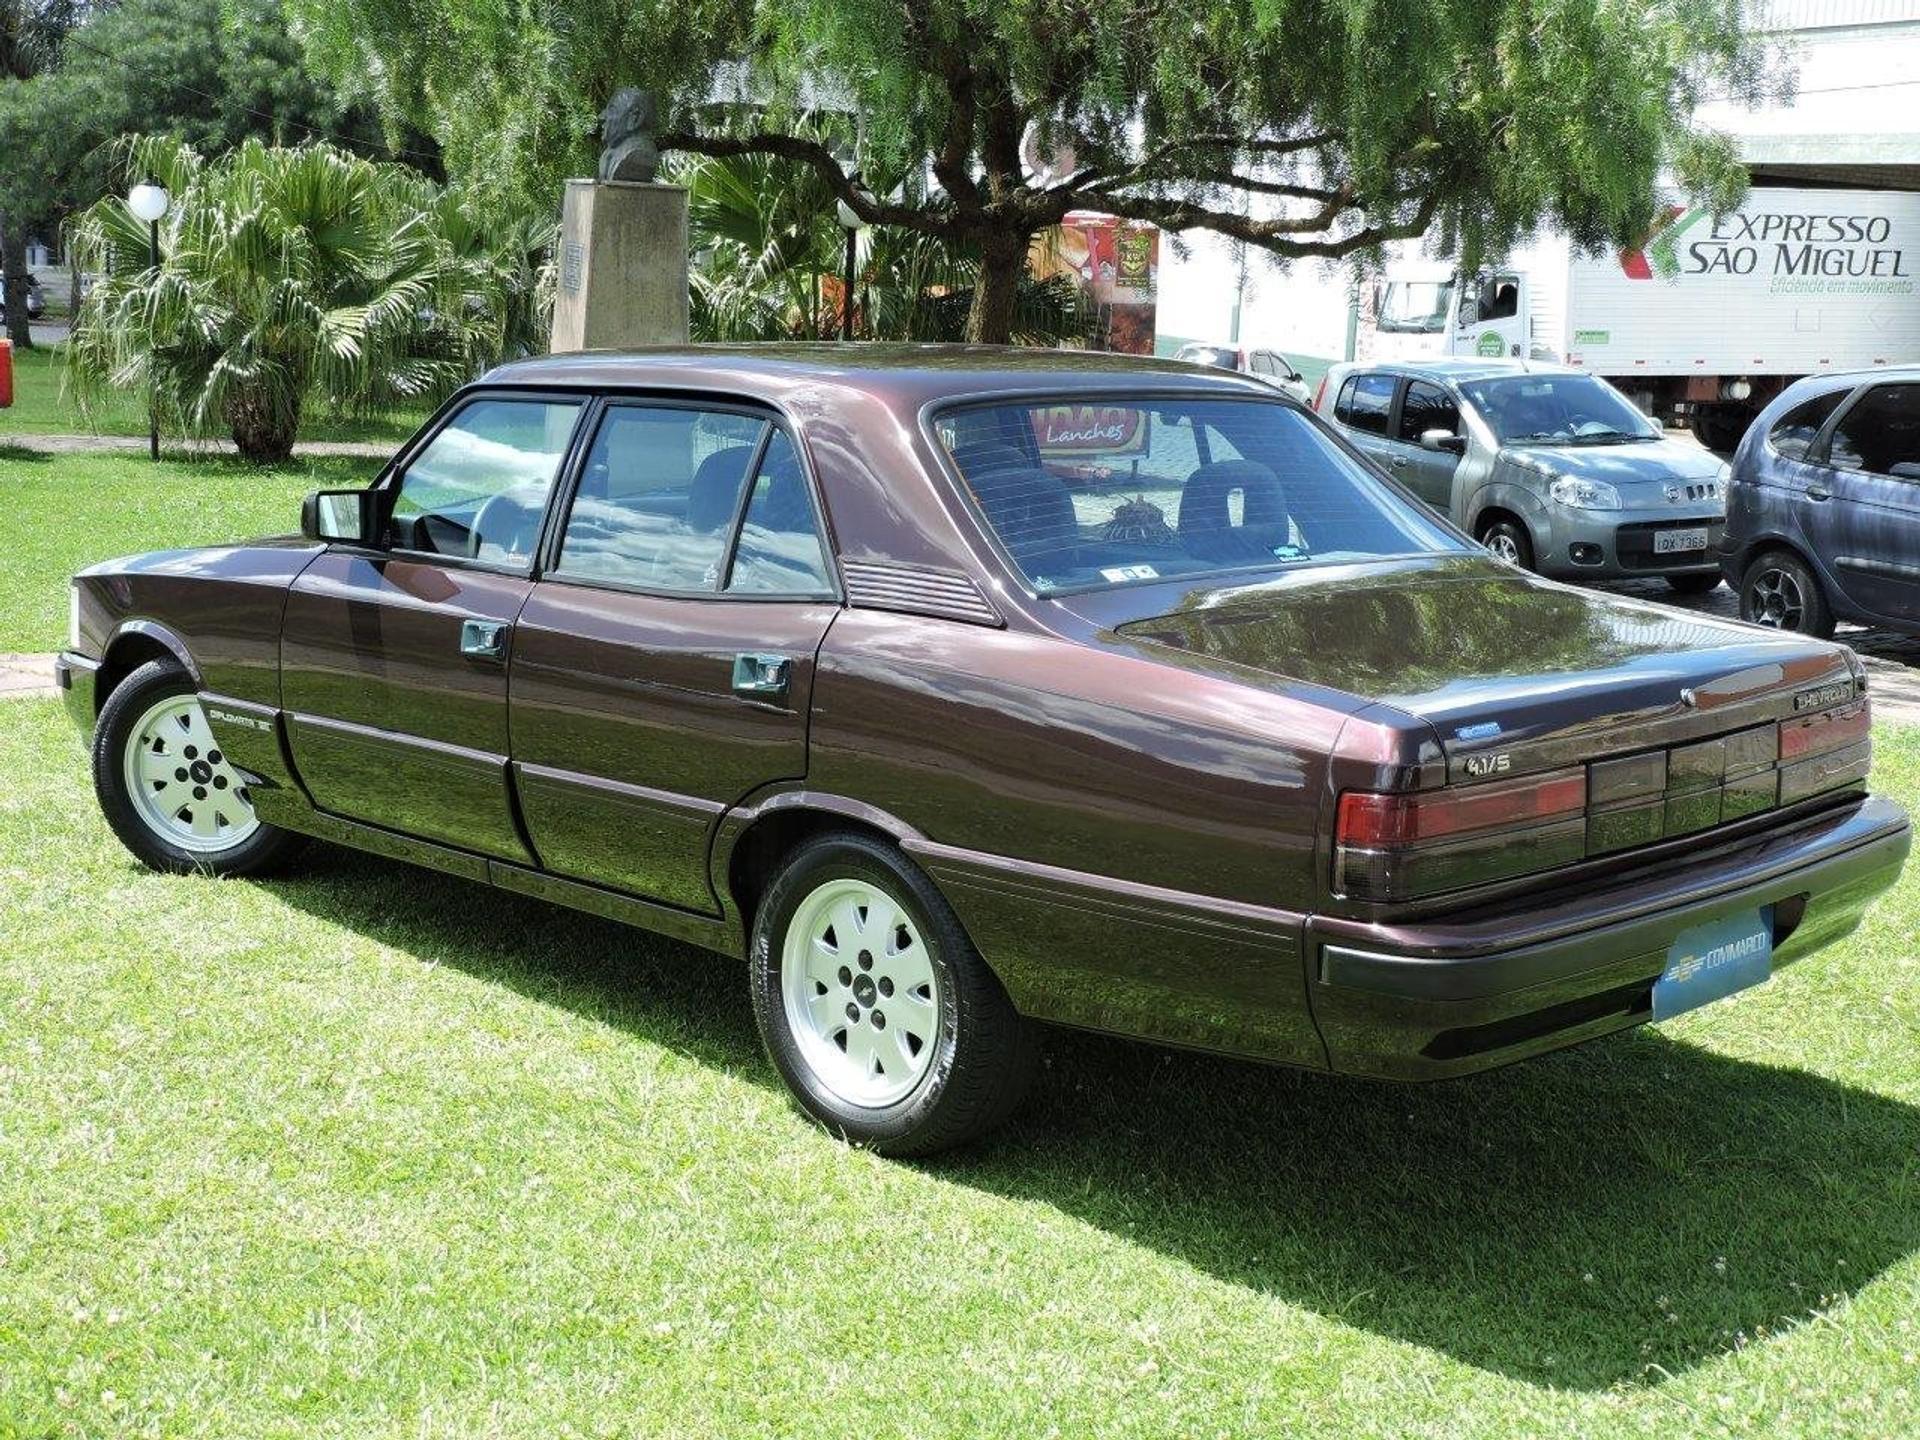 Chevrolet Opala 4.1 Diplomata Se 12v Gasolina 4p Manual Wmimagem19434151455